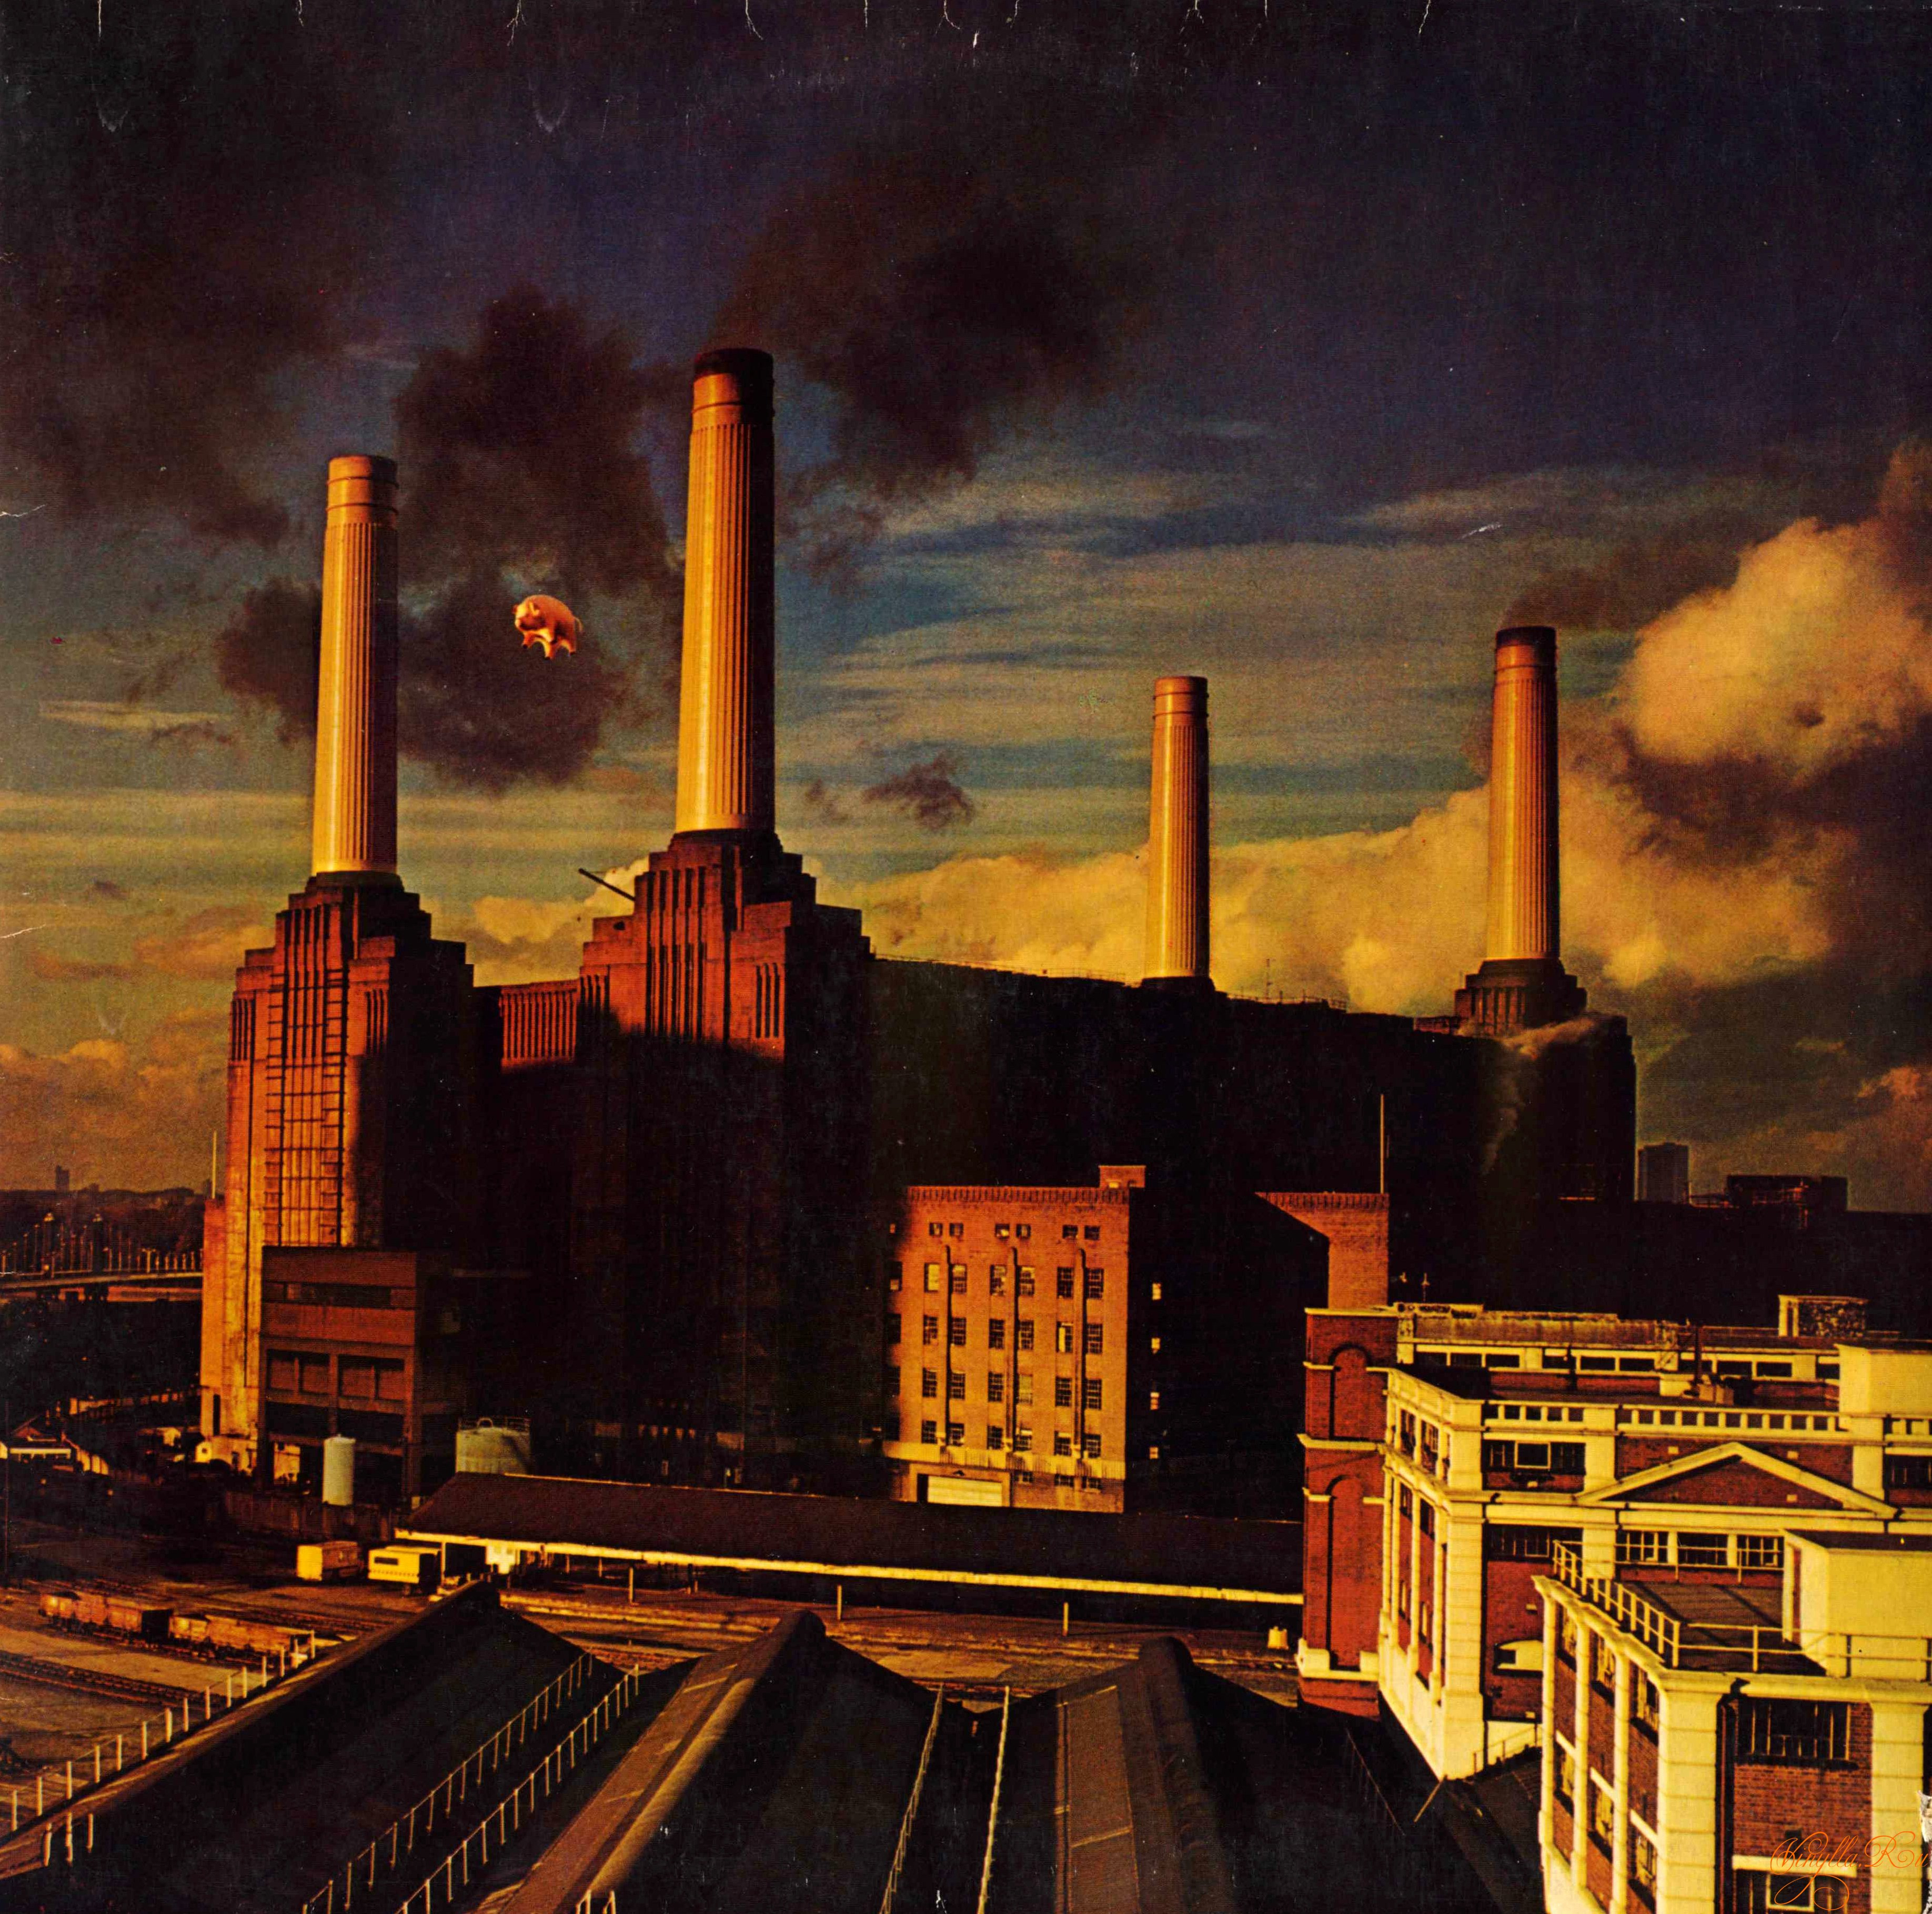 Floyd E Mut Pinkfloyd Pinkfloyd Animals Jpg Skin Pinkfloyd Floyd 3672x3637